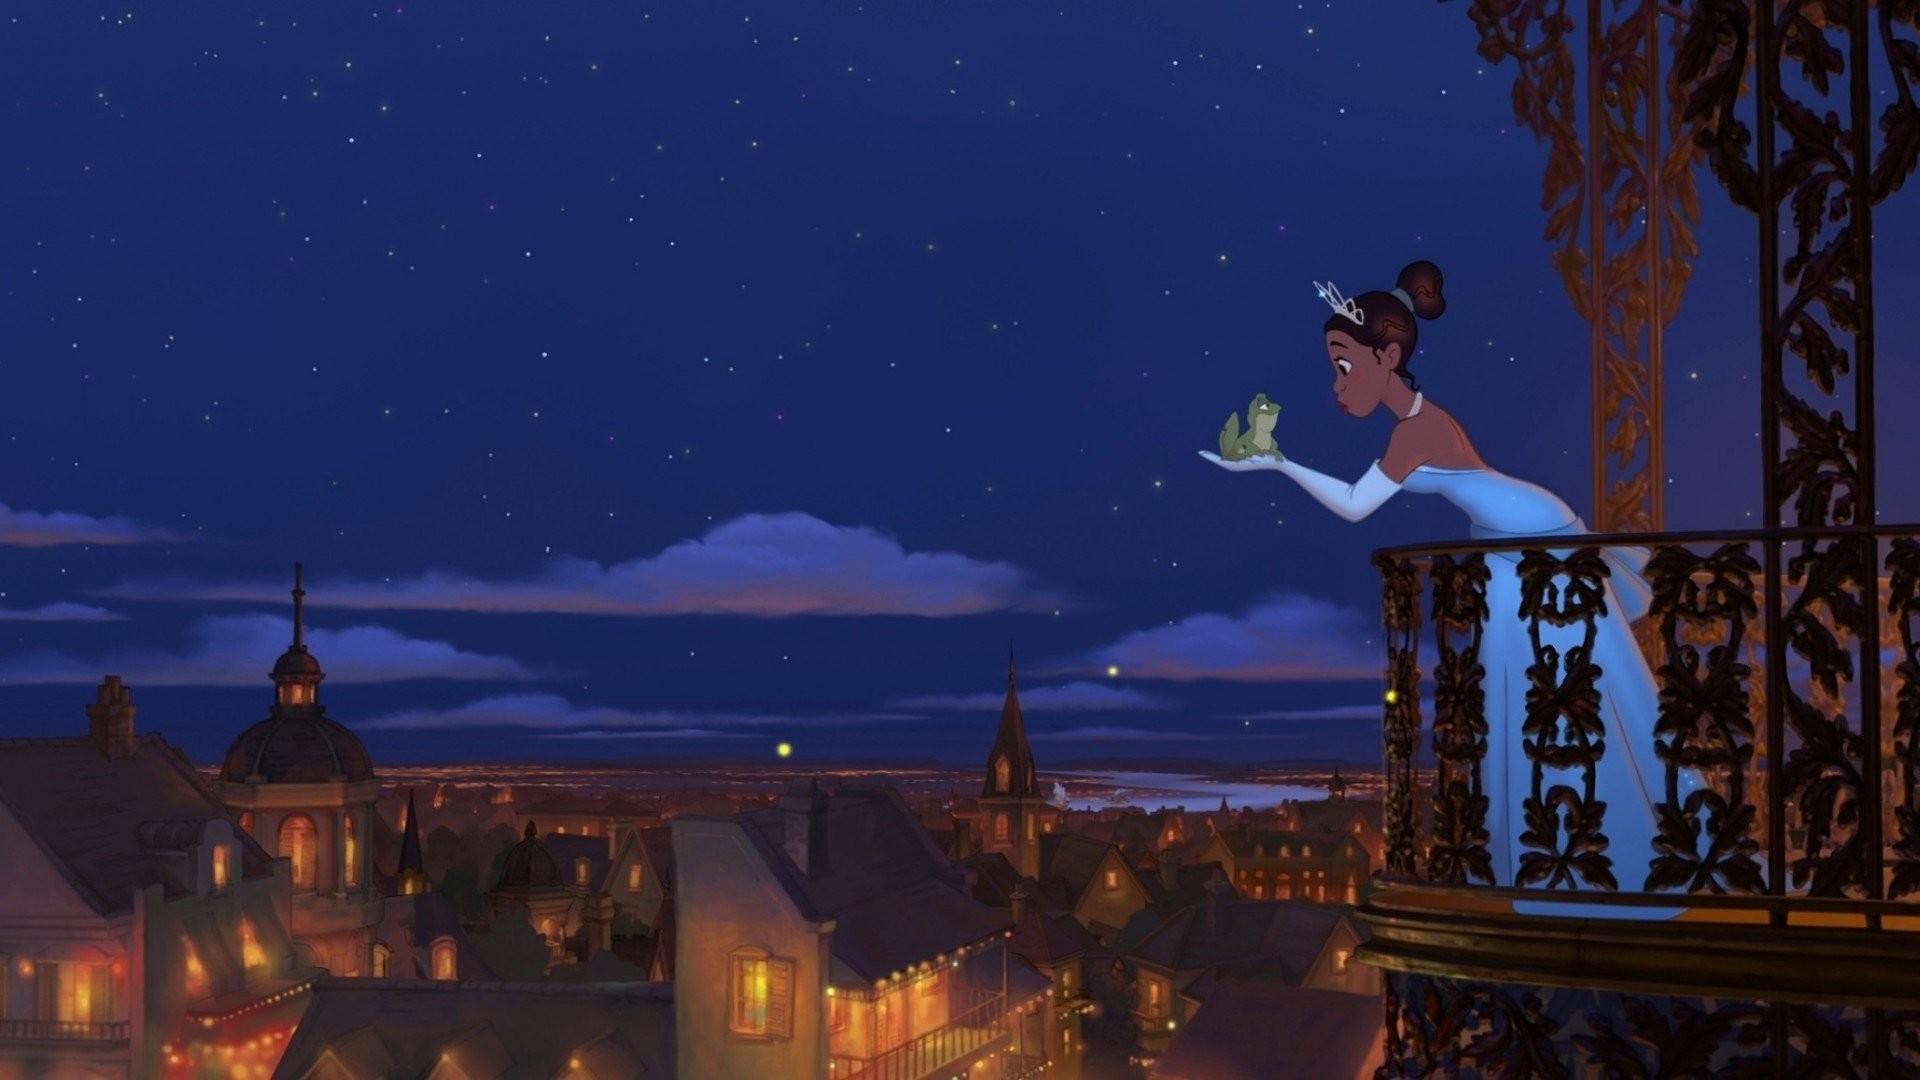 Disney Laptop Wallpaper – The Best background